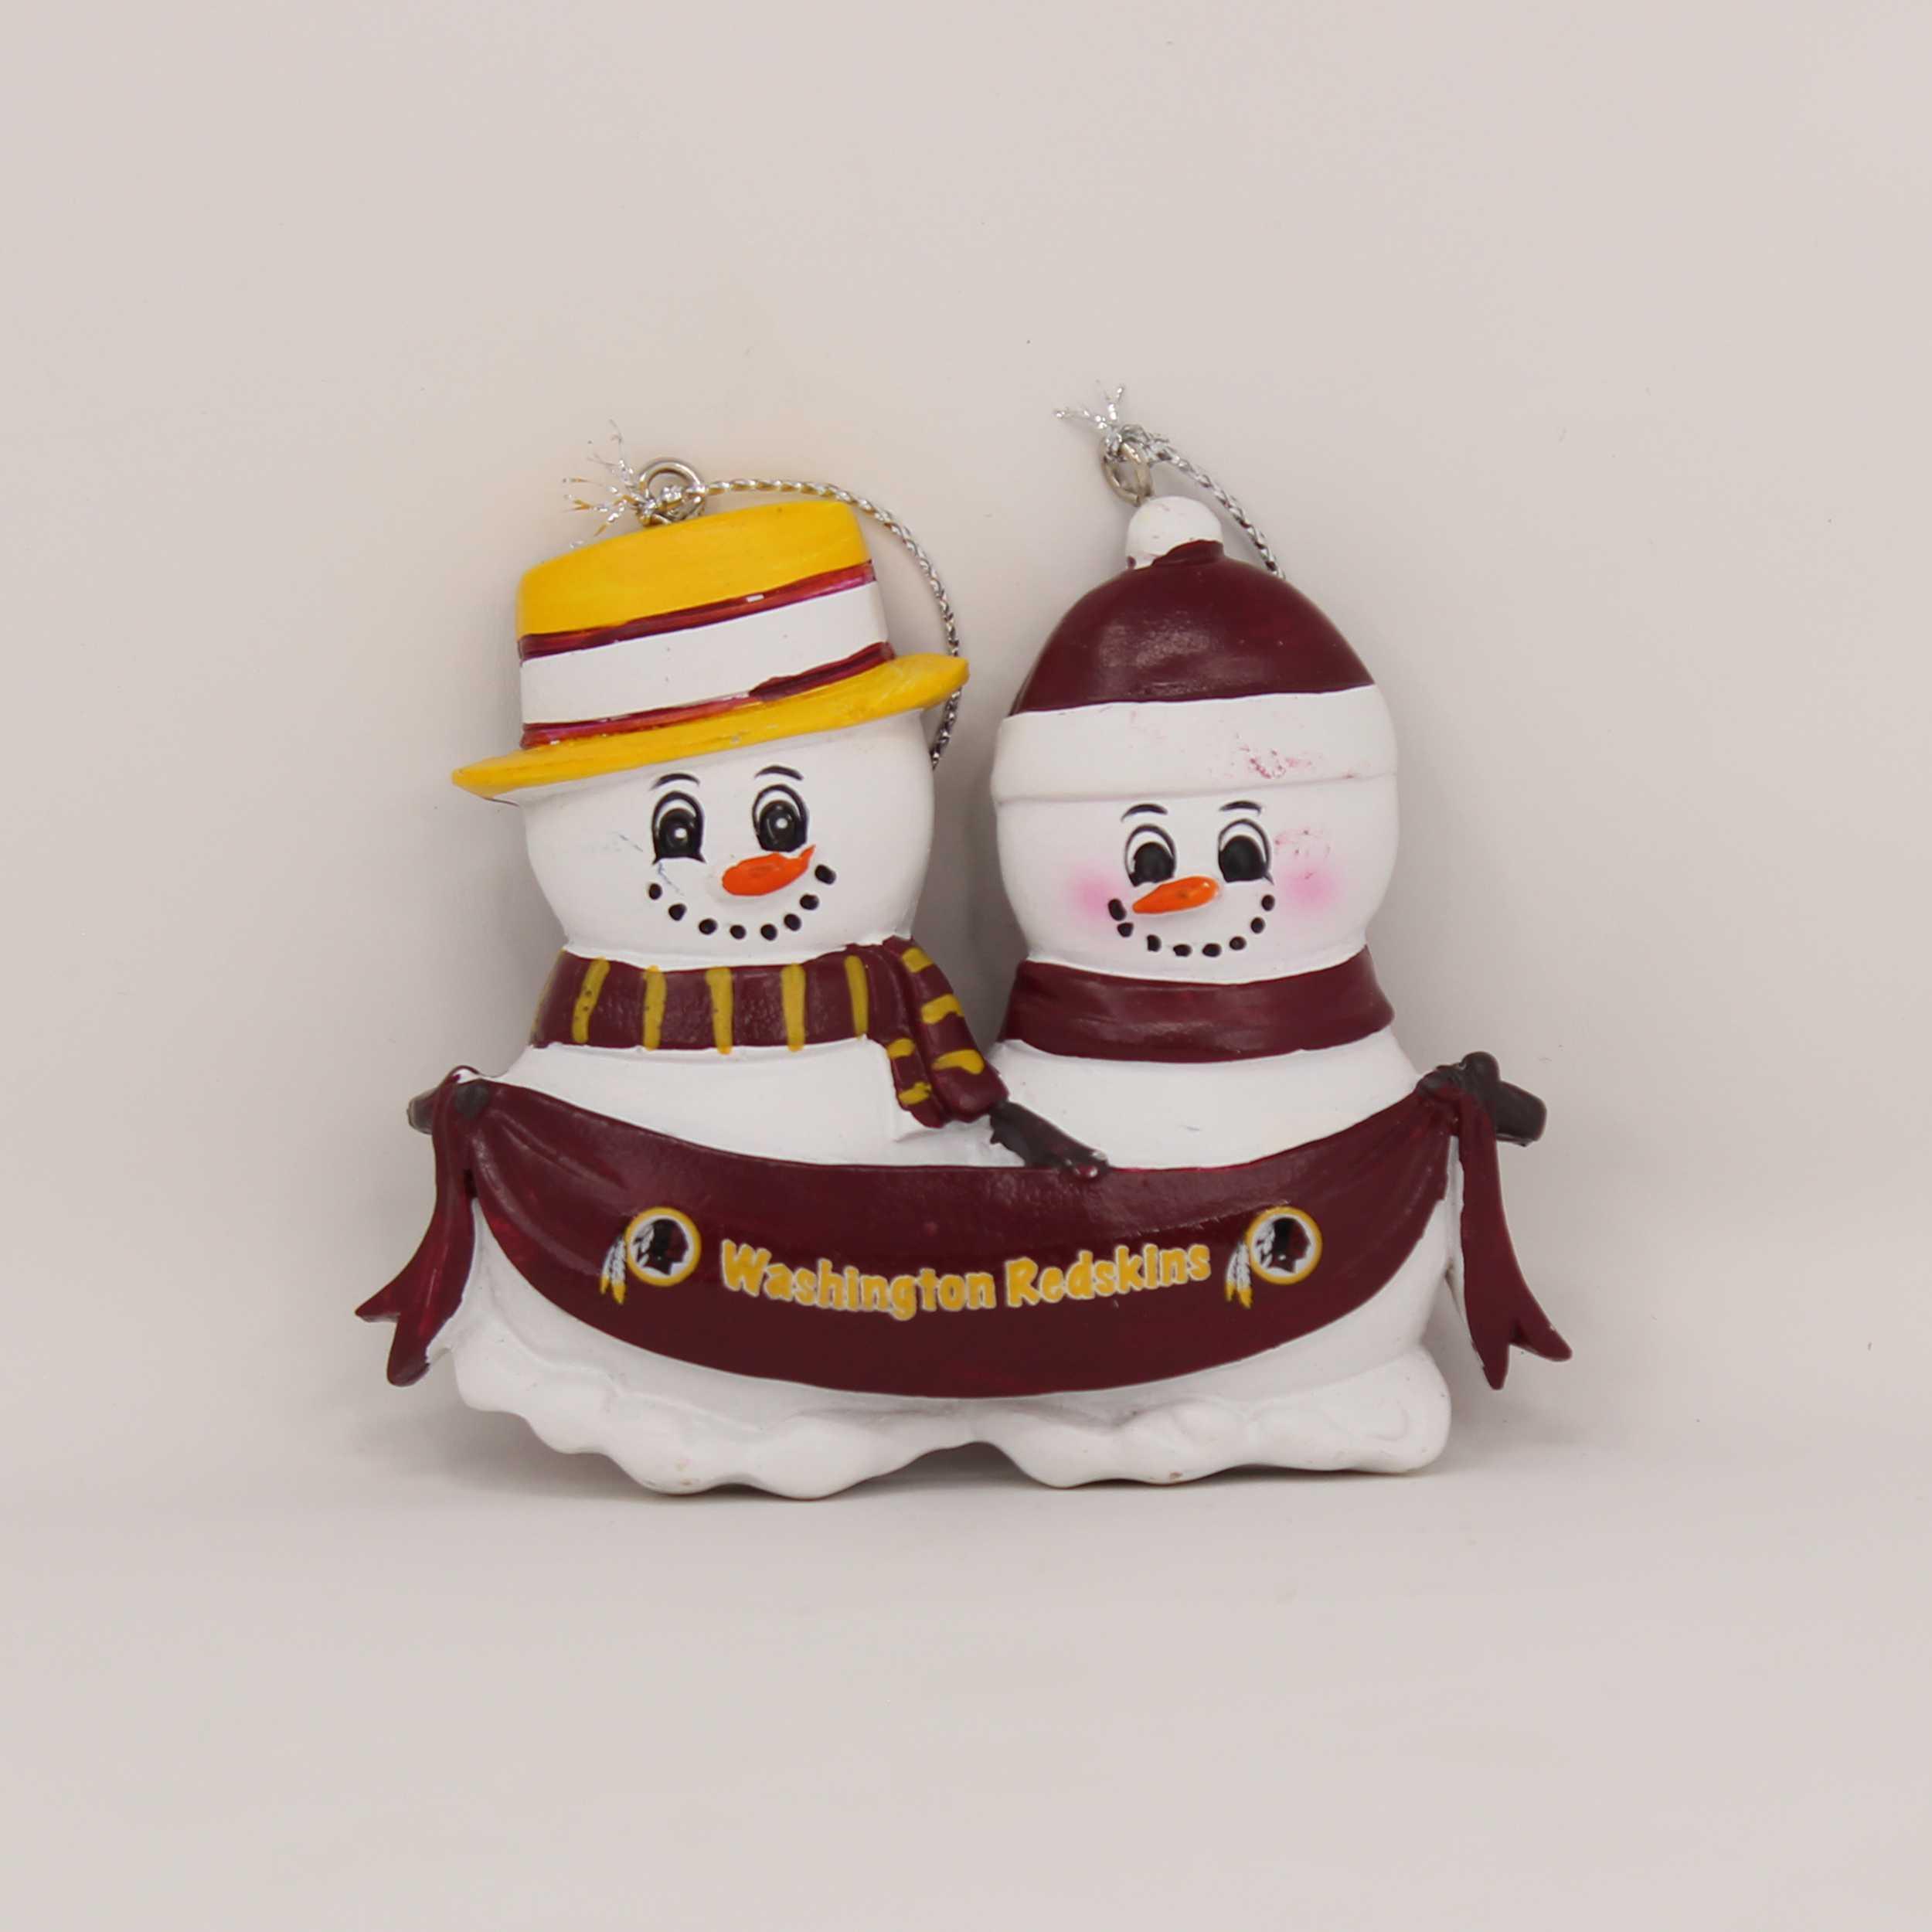 Personalized Family Ornament Washington Redskins